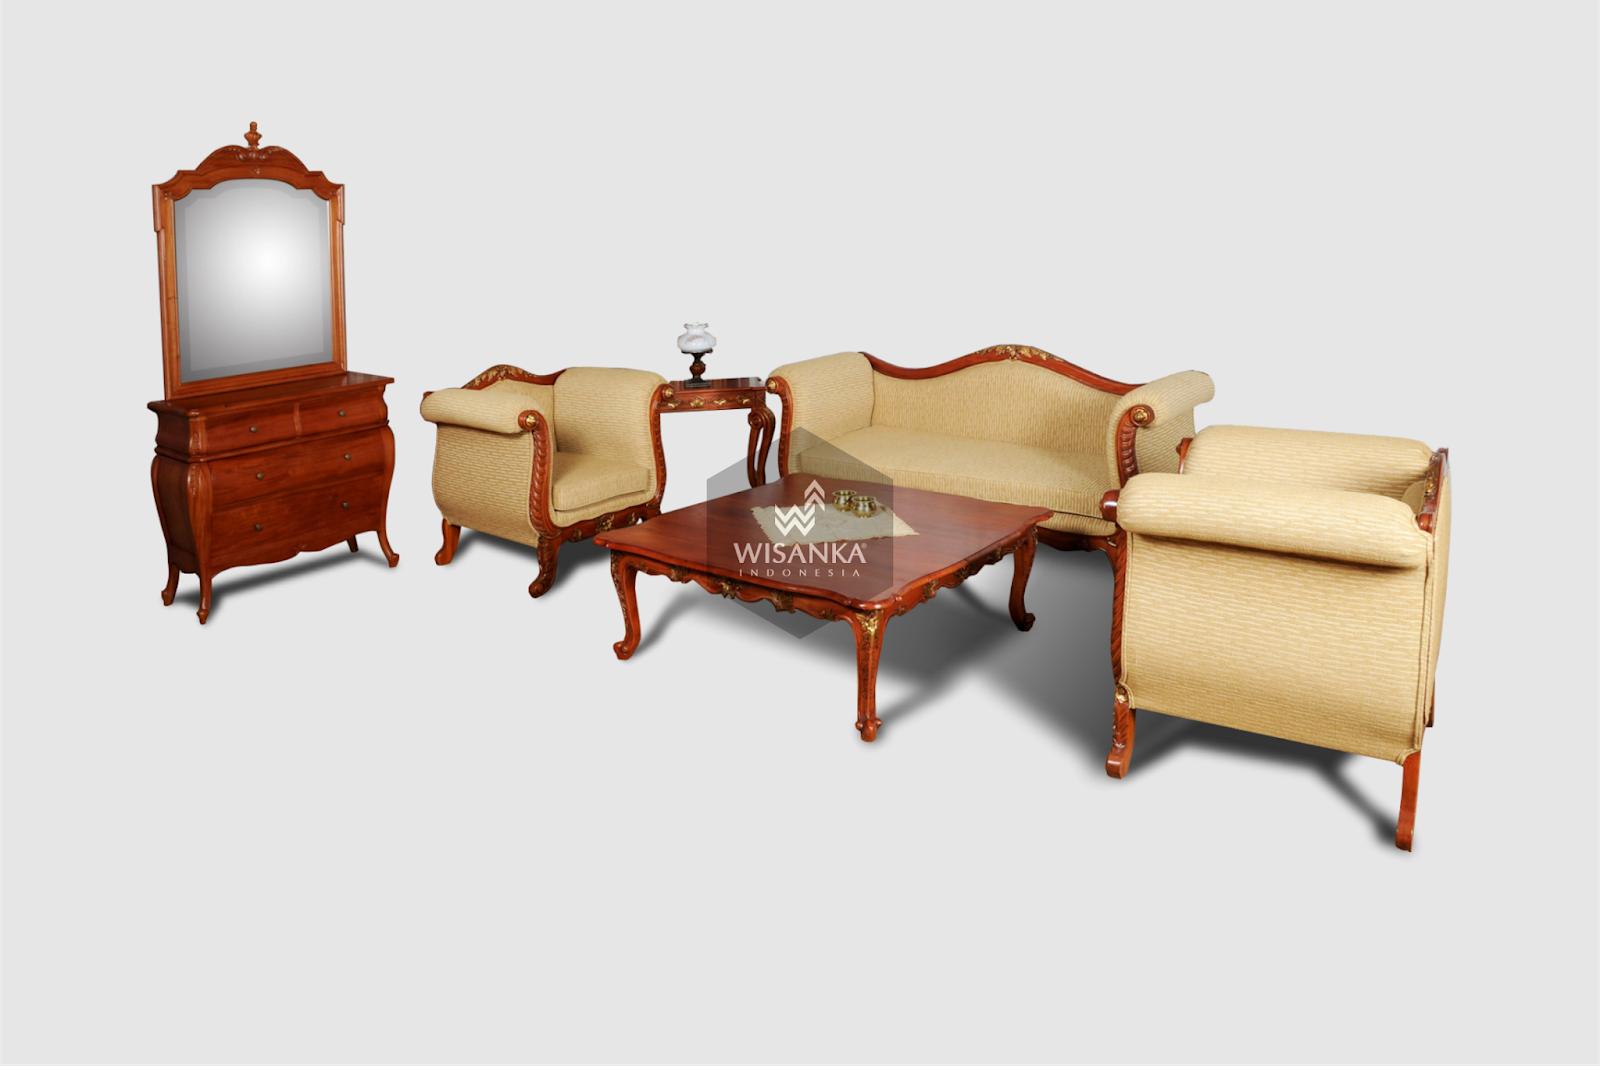 Oil For Teak Wood Furniture Maintenance